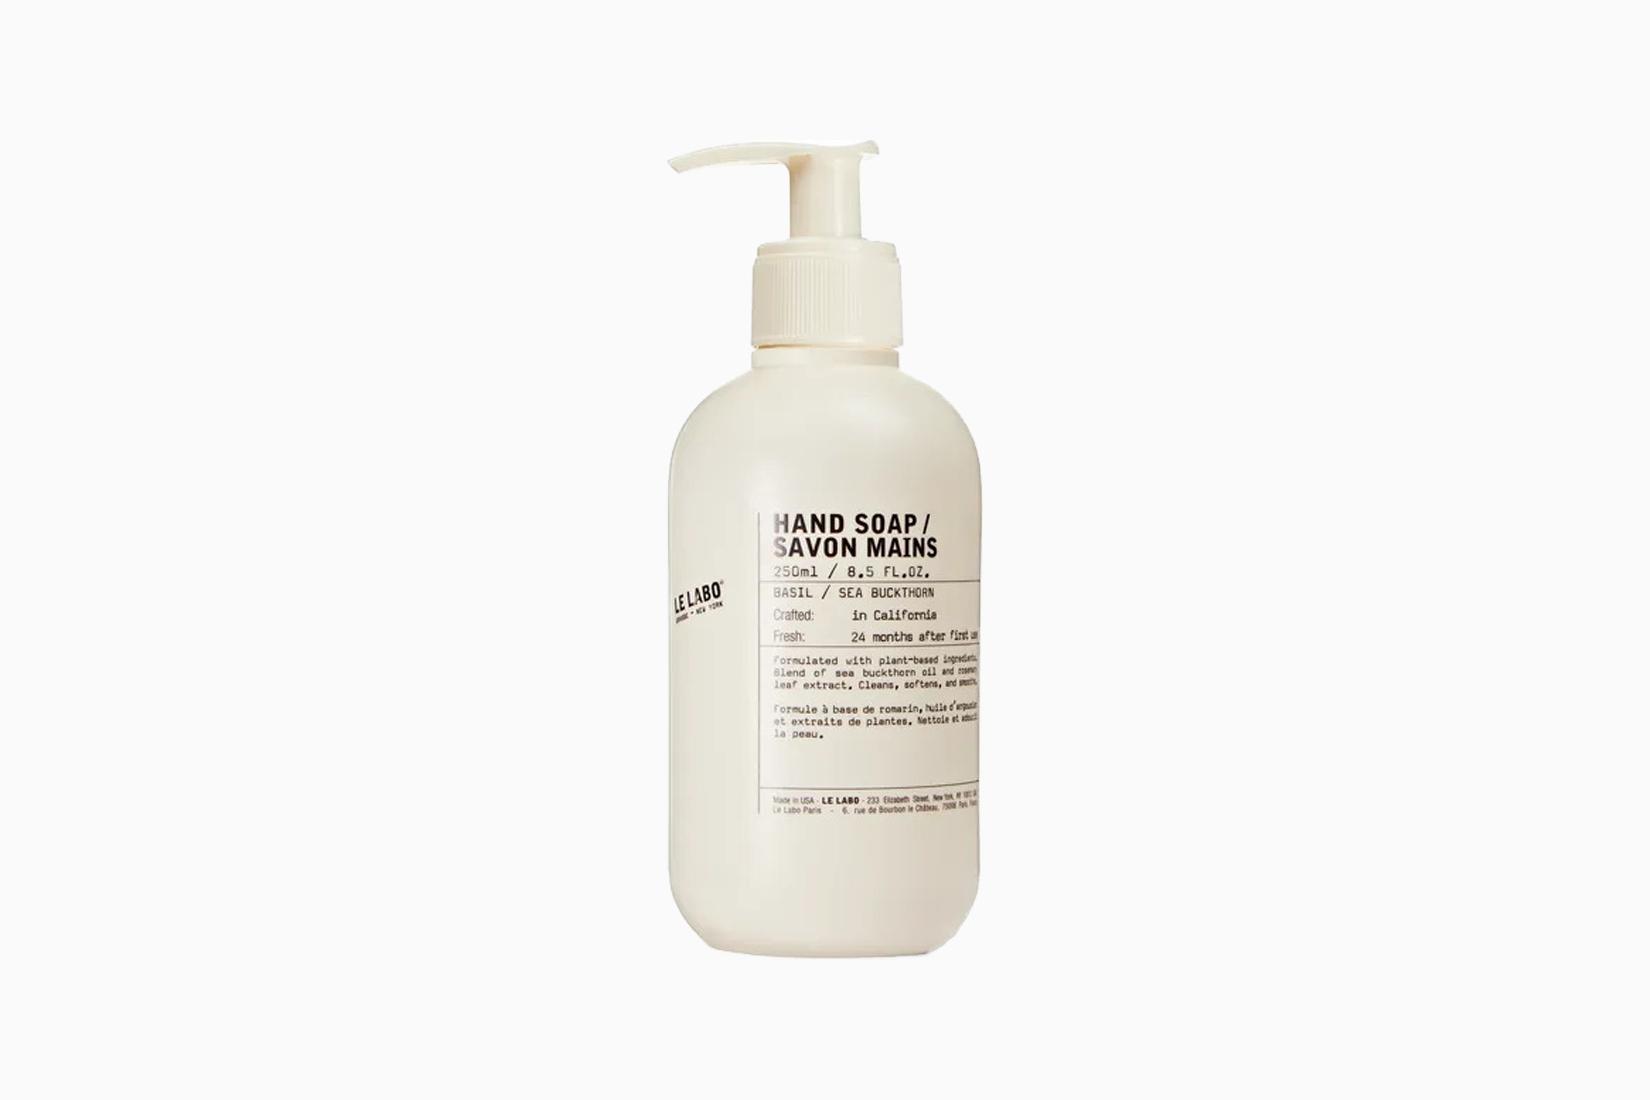 best hand soap le labo review - Luxe Digital